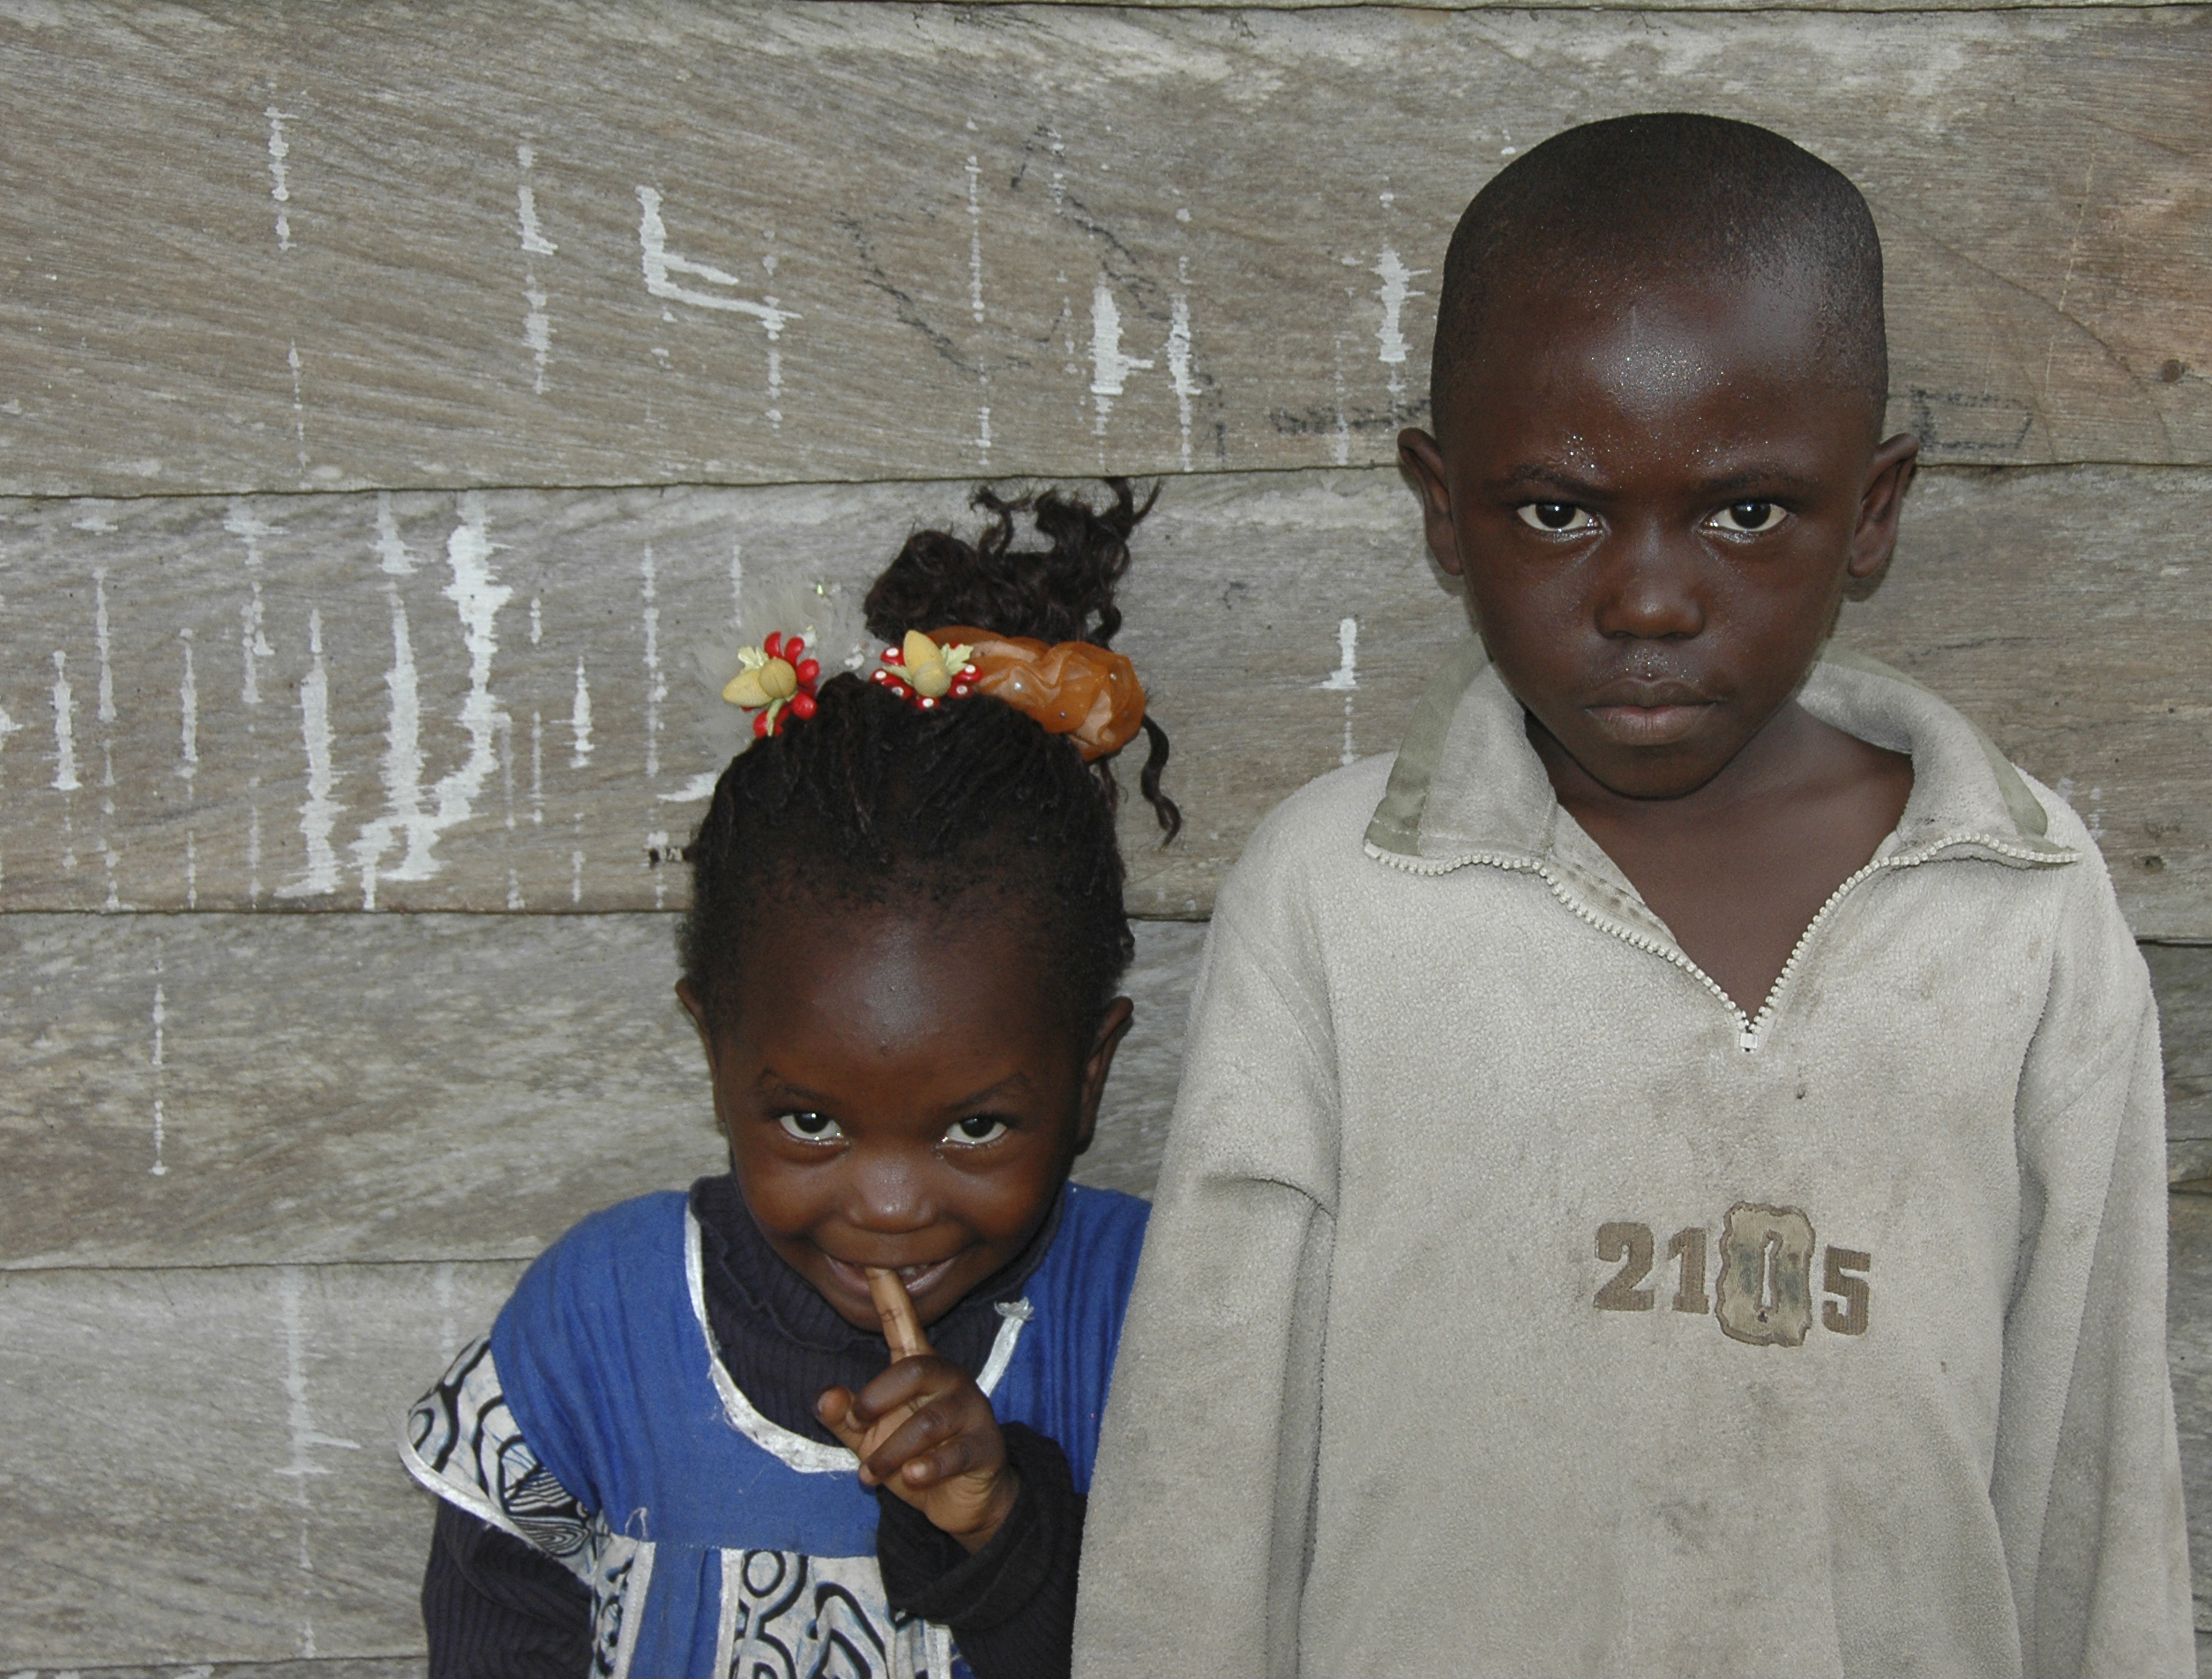 Bokwa 3 (Cameroon)(2009)